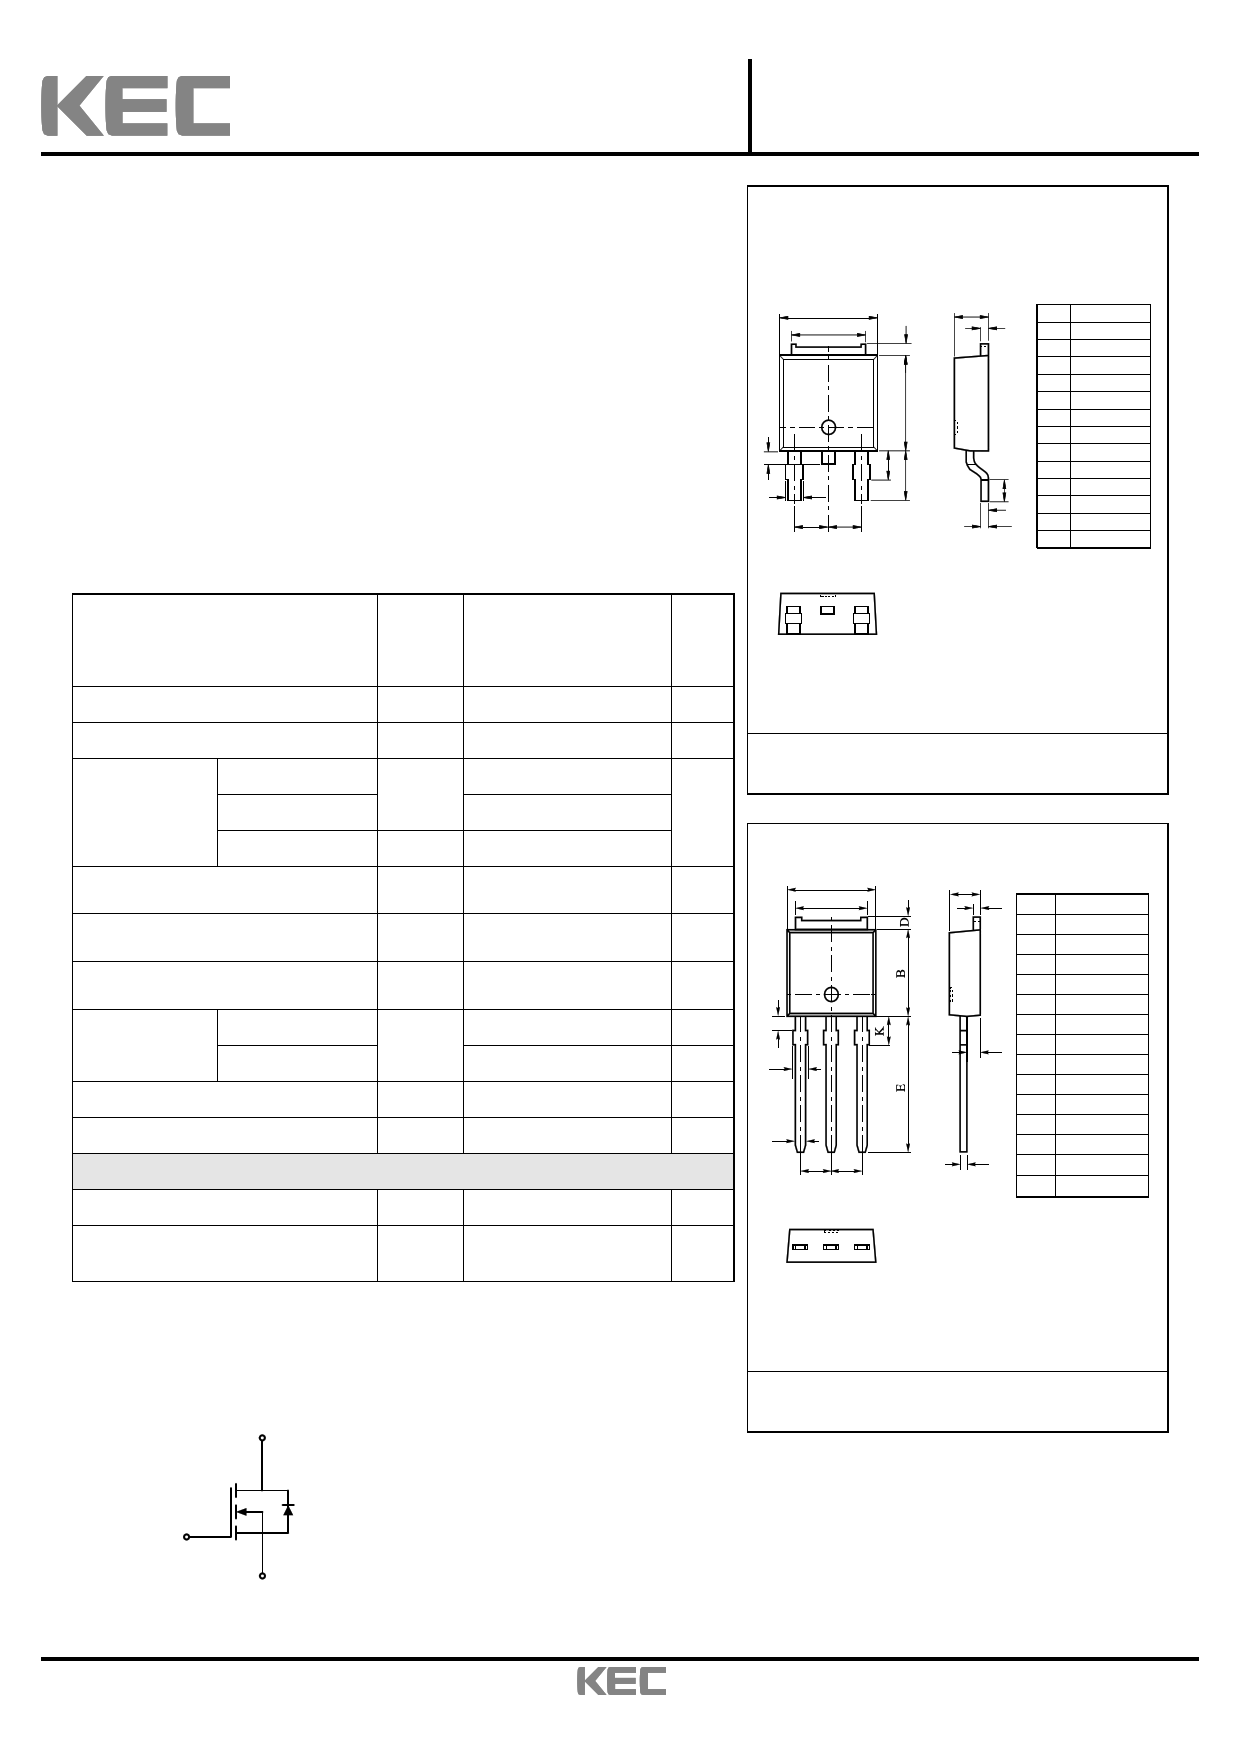 KF3N60I datasheet